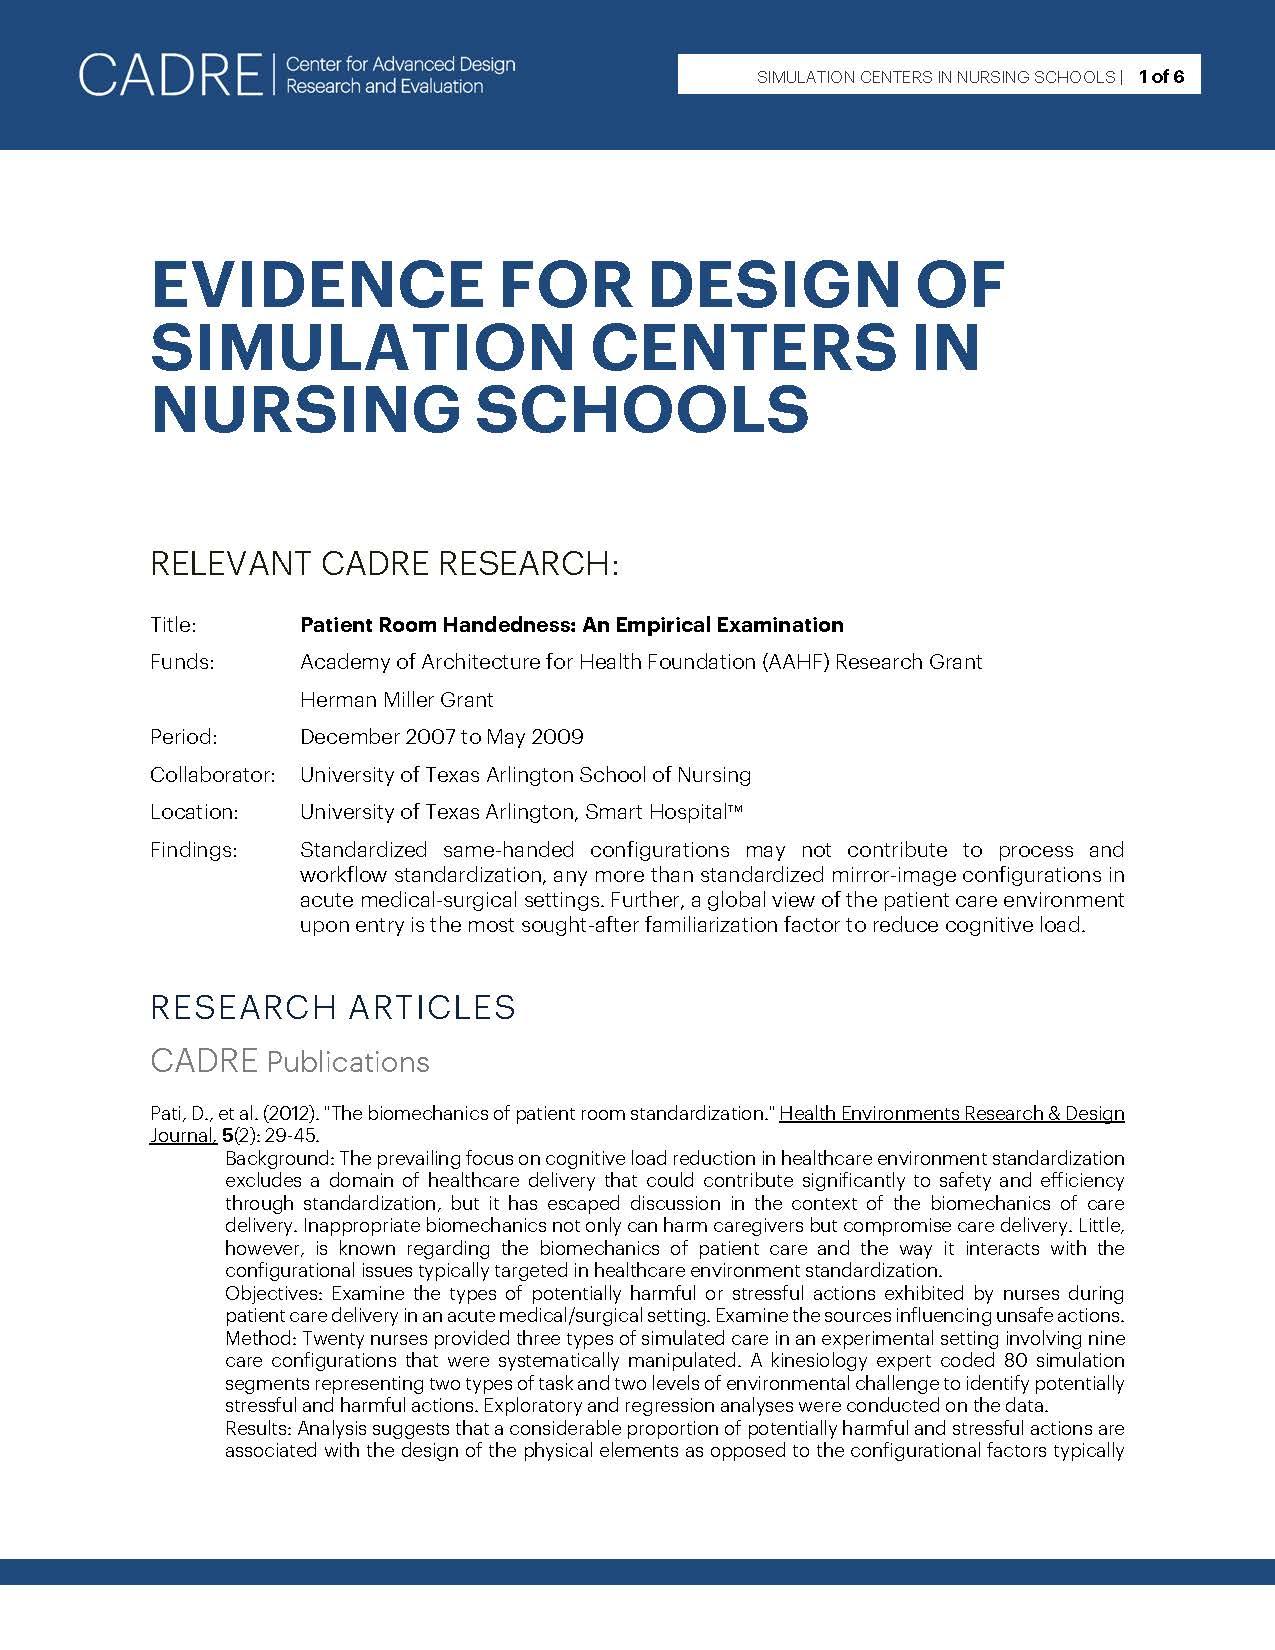 EVIDENCE FOR NURSING SCHOOL SIMULATION CENTERS_Resource List.jpg